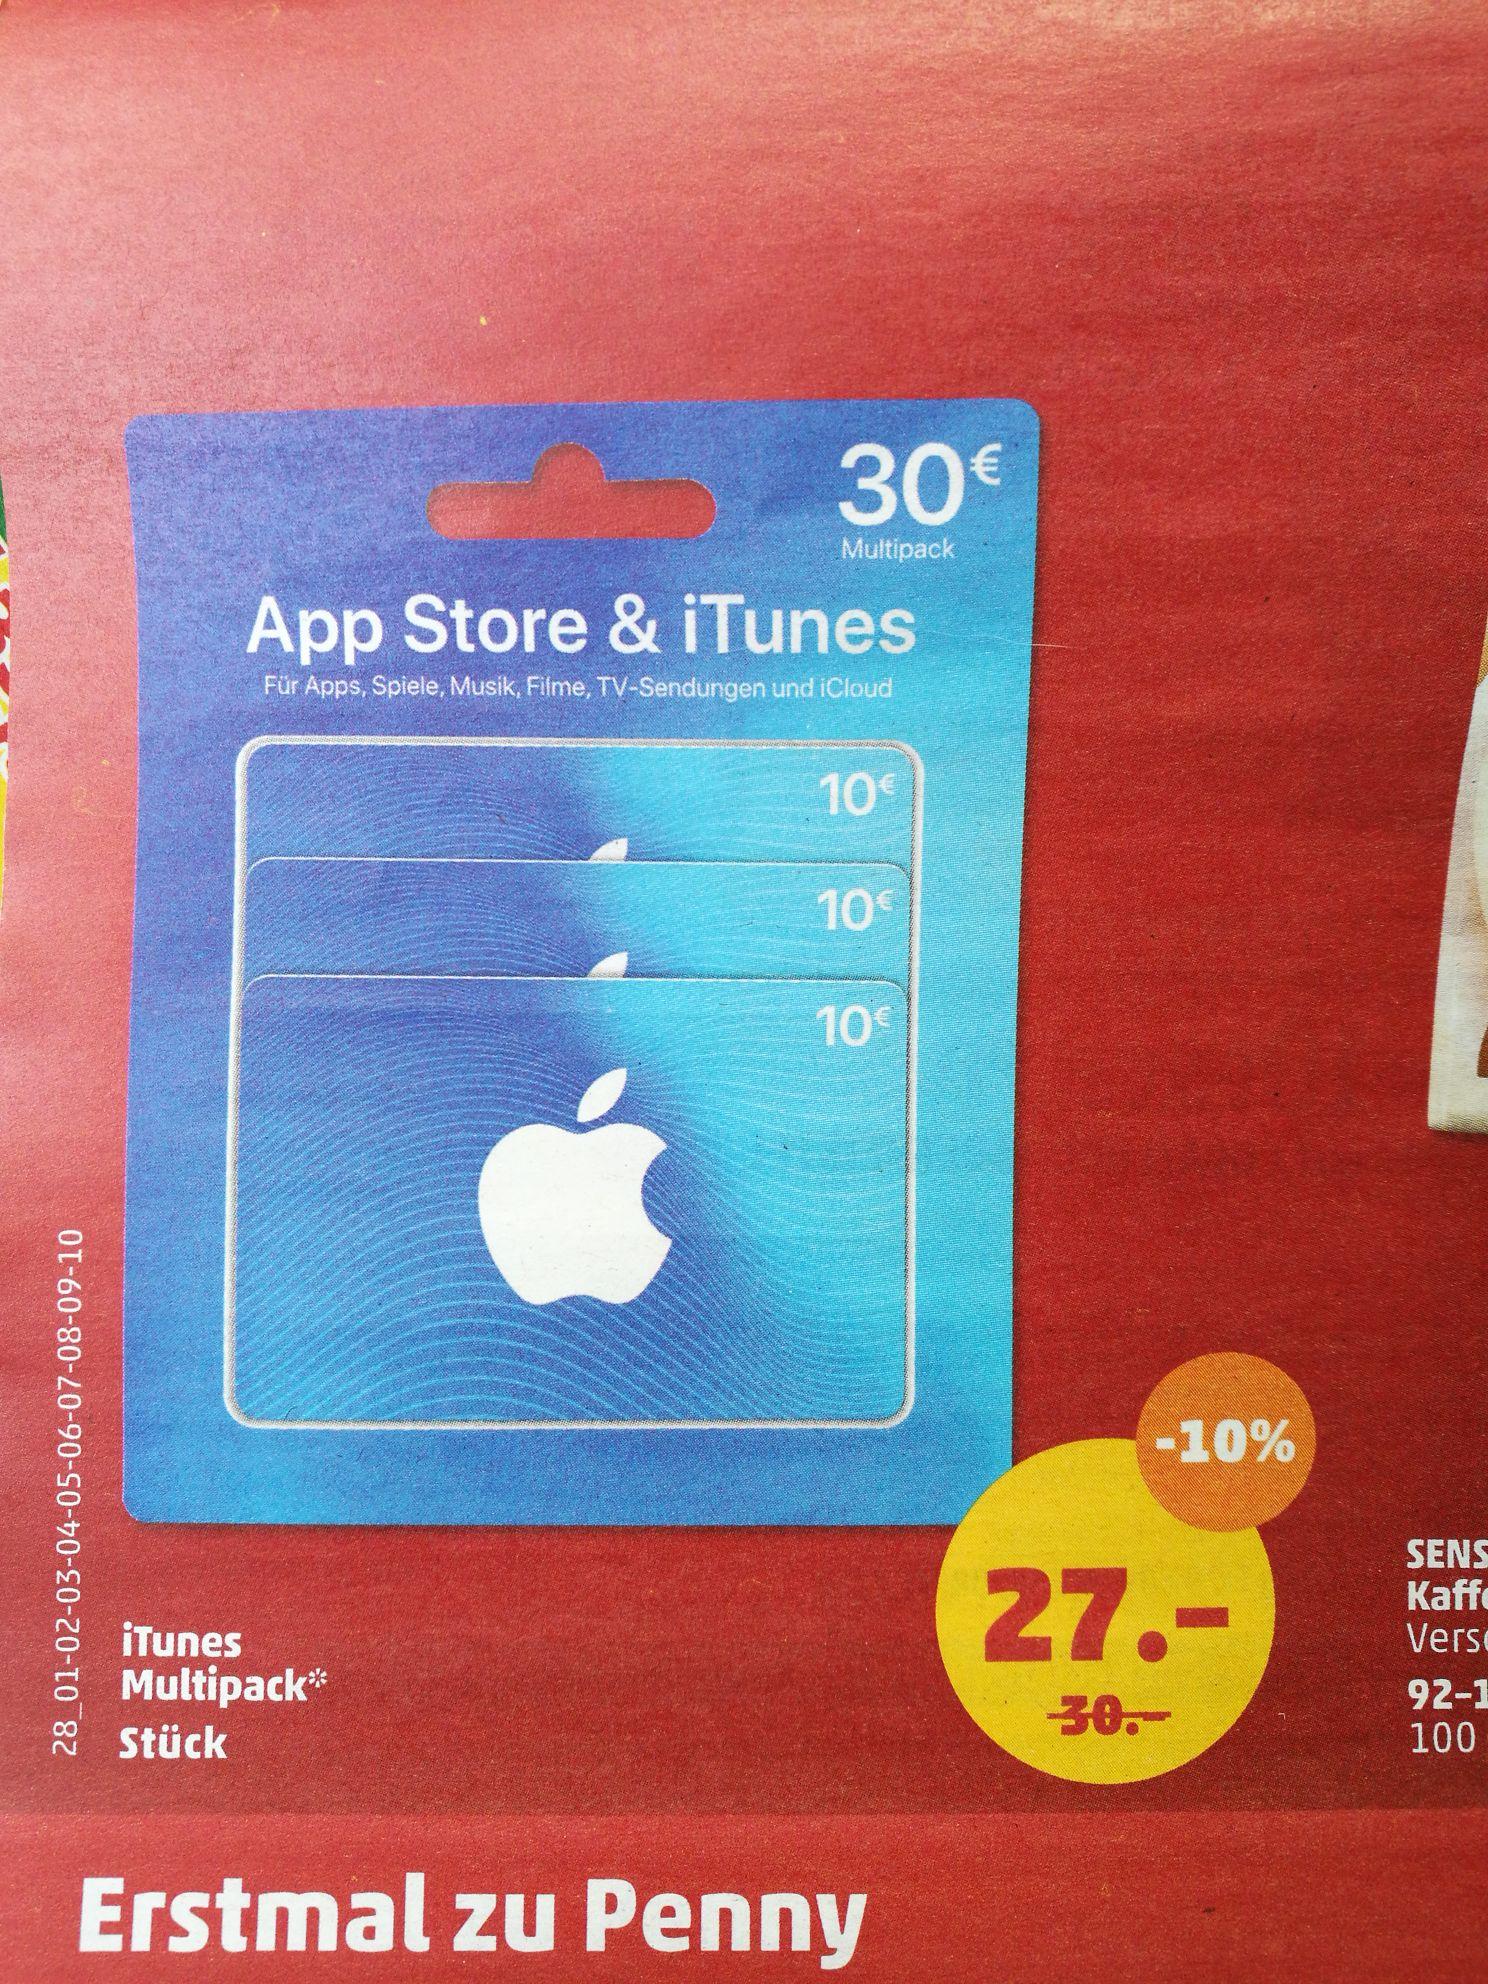 iTunes Multipack - 3 mal 10 EUR für 27 EUR